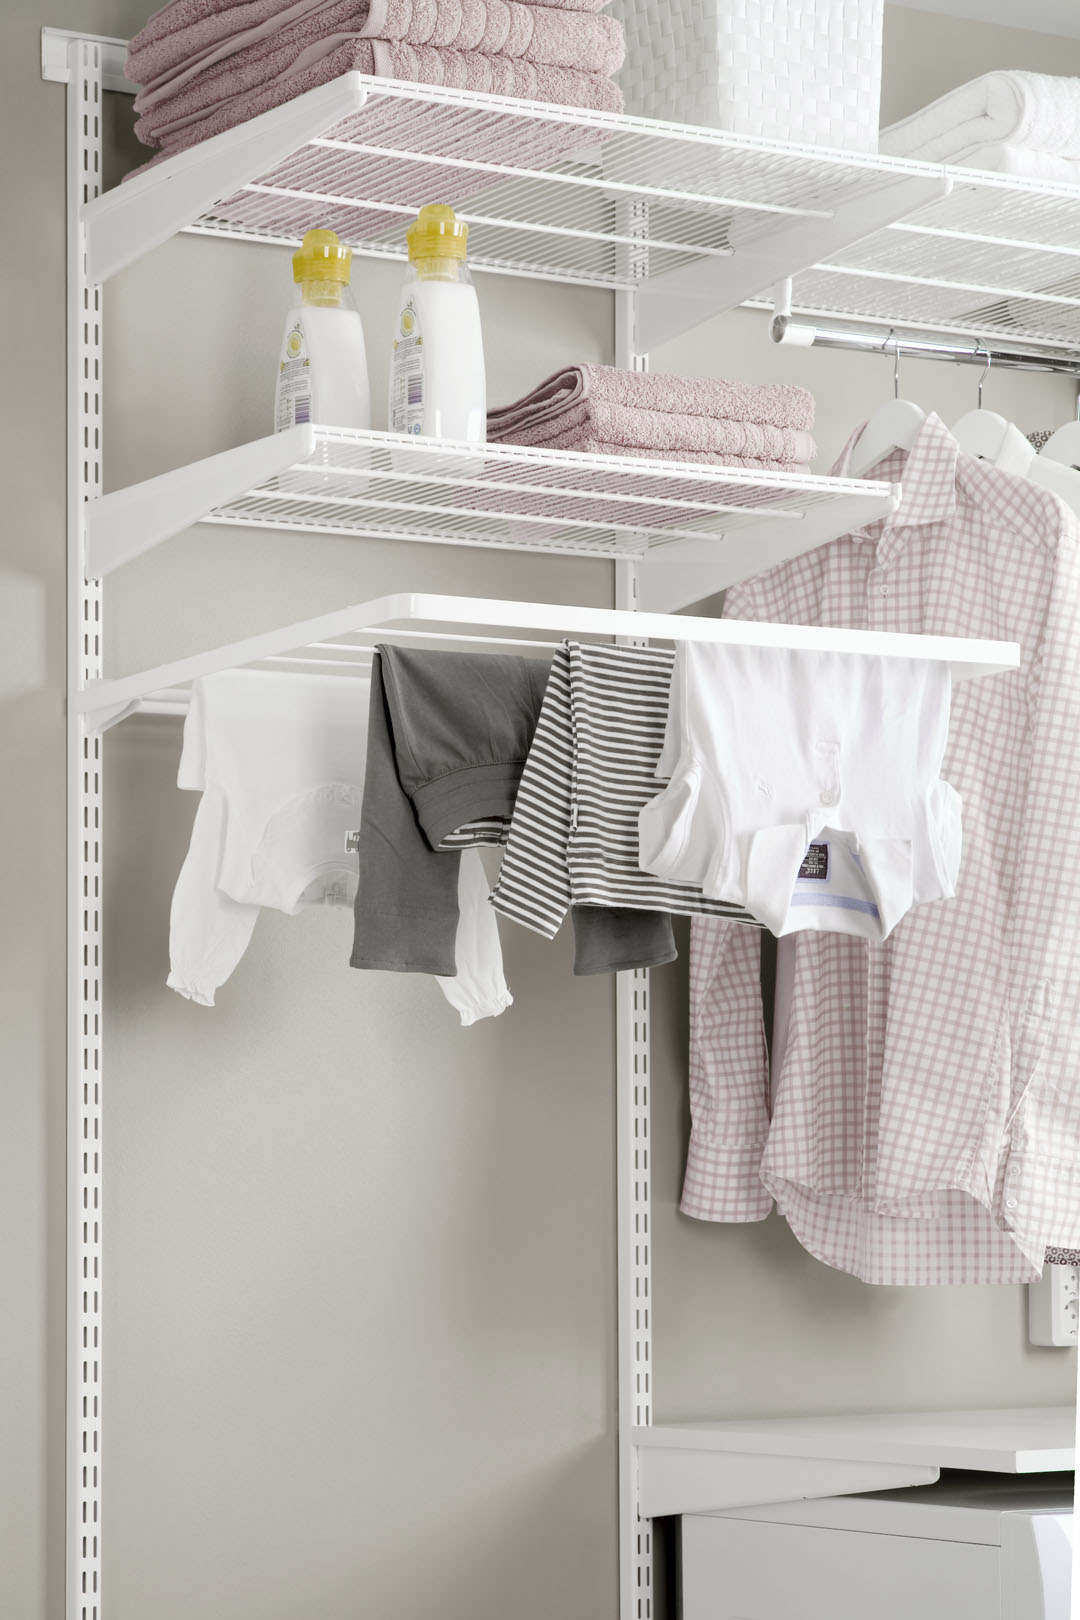 Laundry Drying Shelf